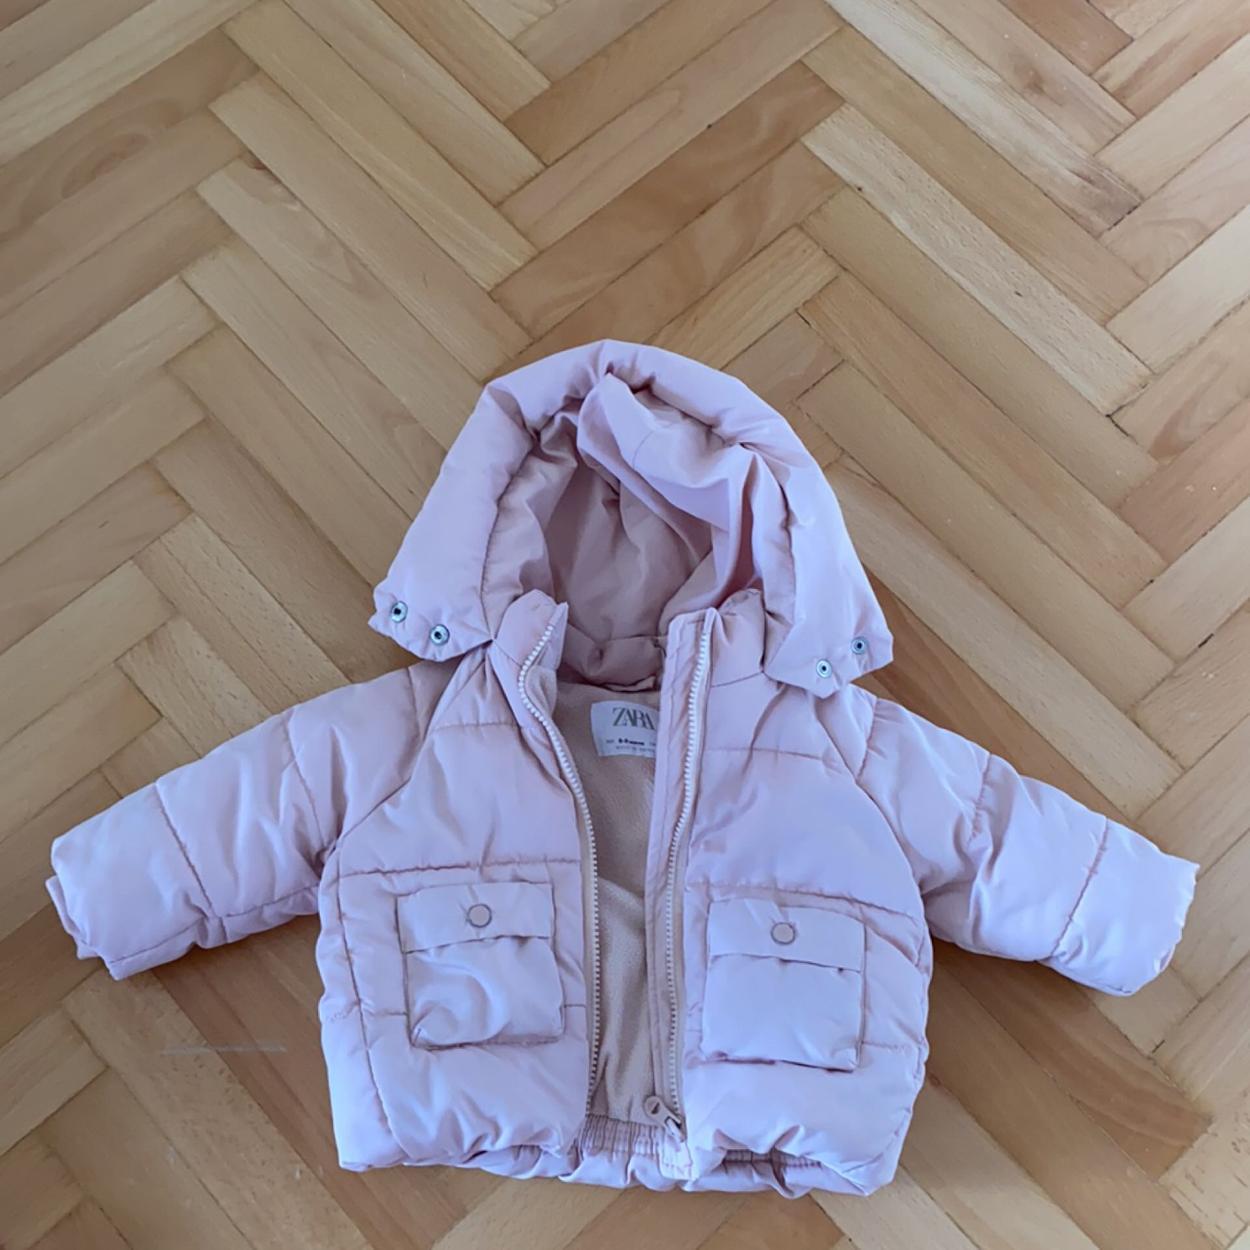 Zara Mont & Ceket